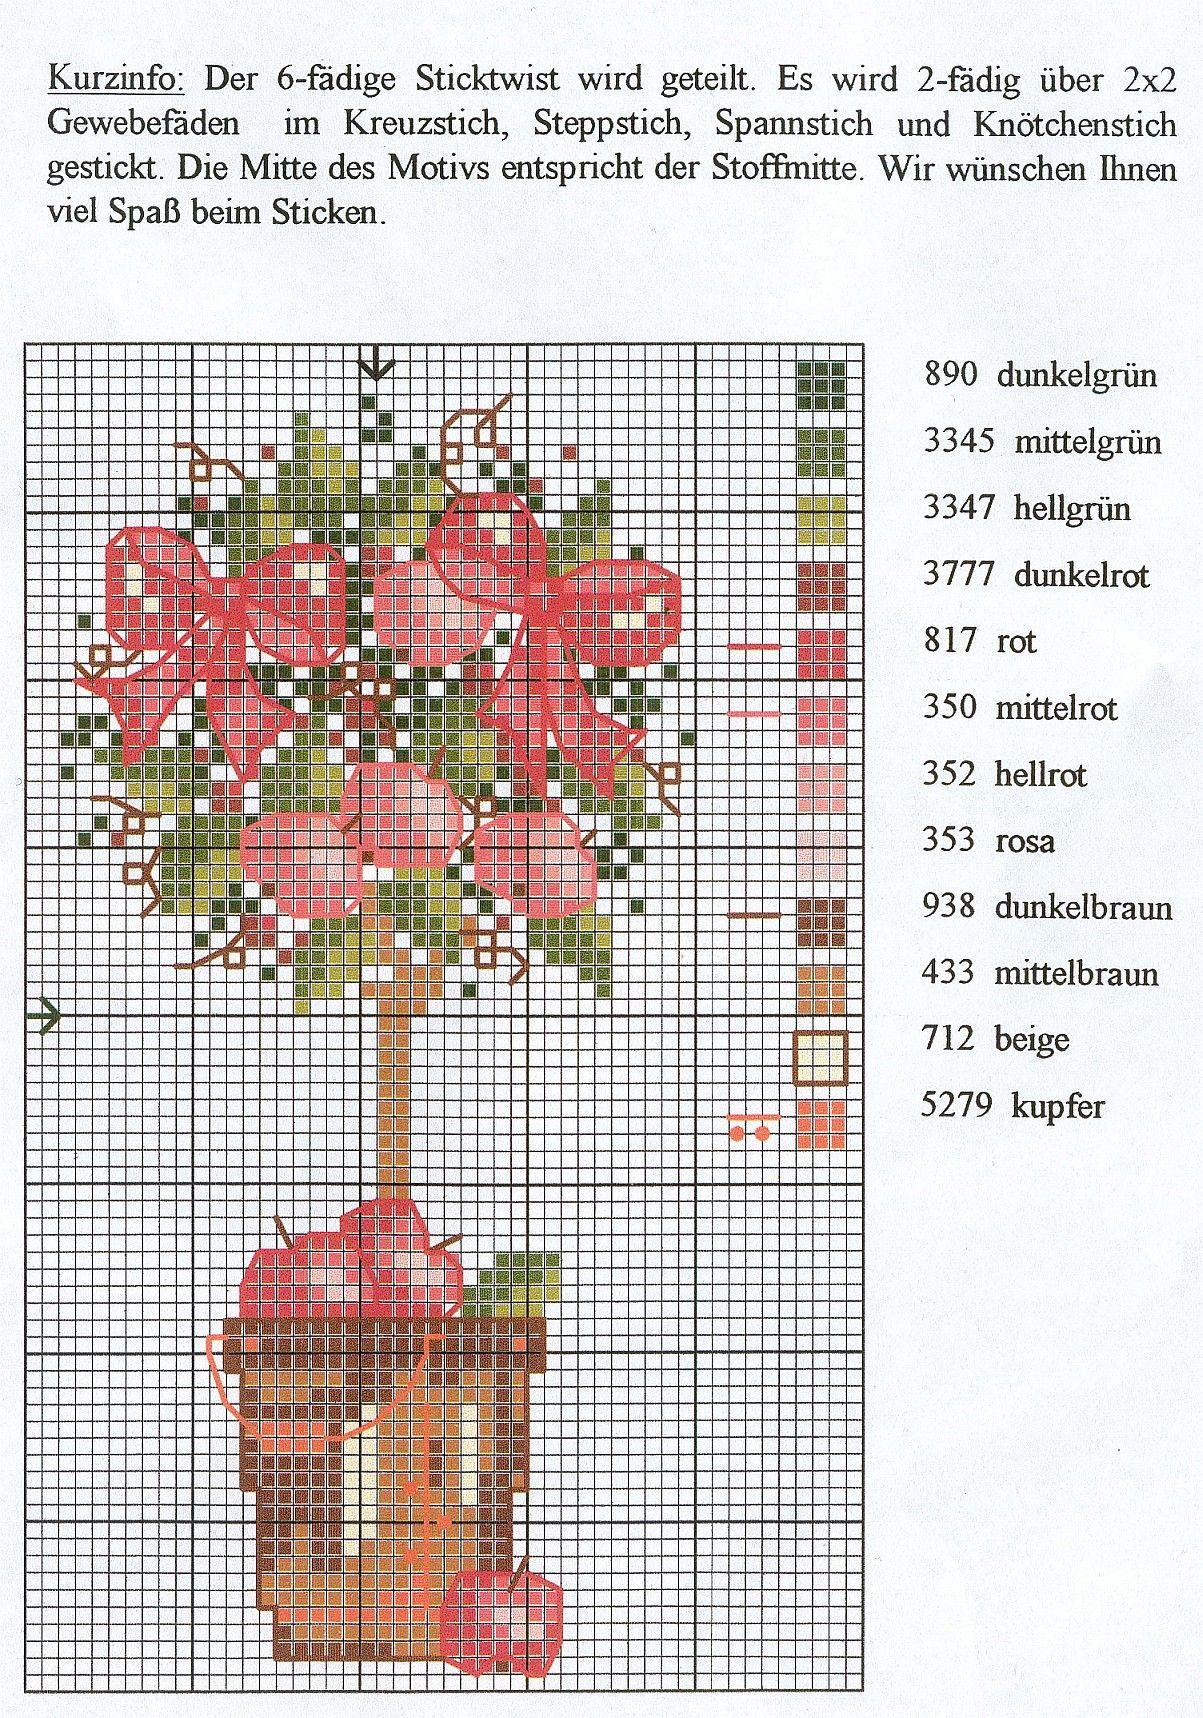 Ulrikegalleryru Watchph=Ek9 Cgtyb&Subpanel=Zoom&Zoom=8 Cross Stitch Treecross